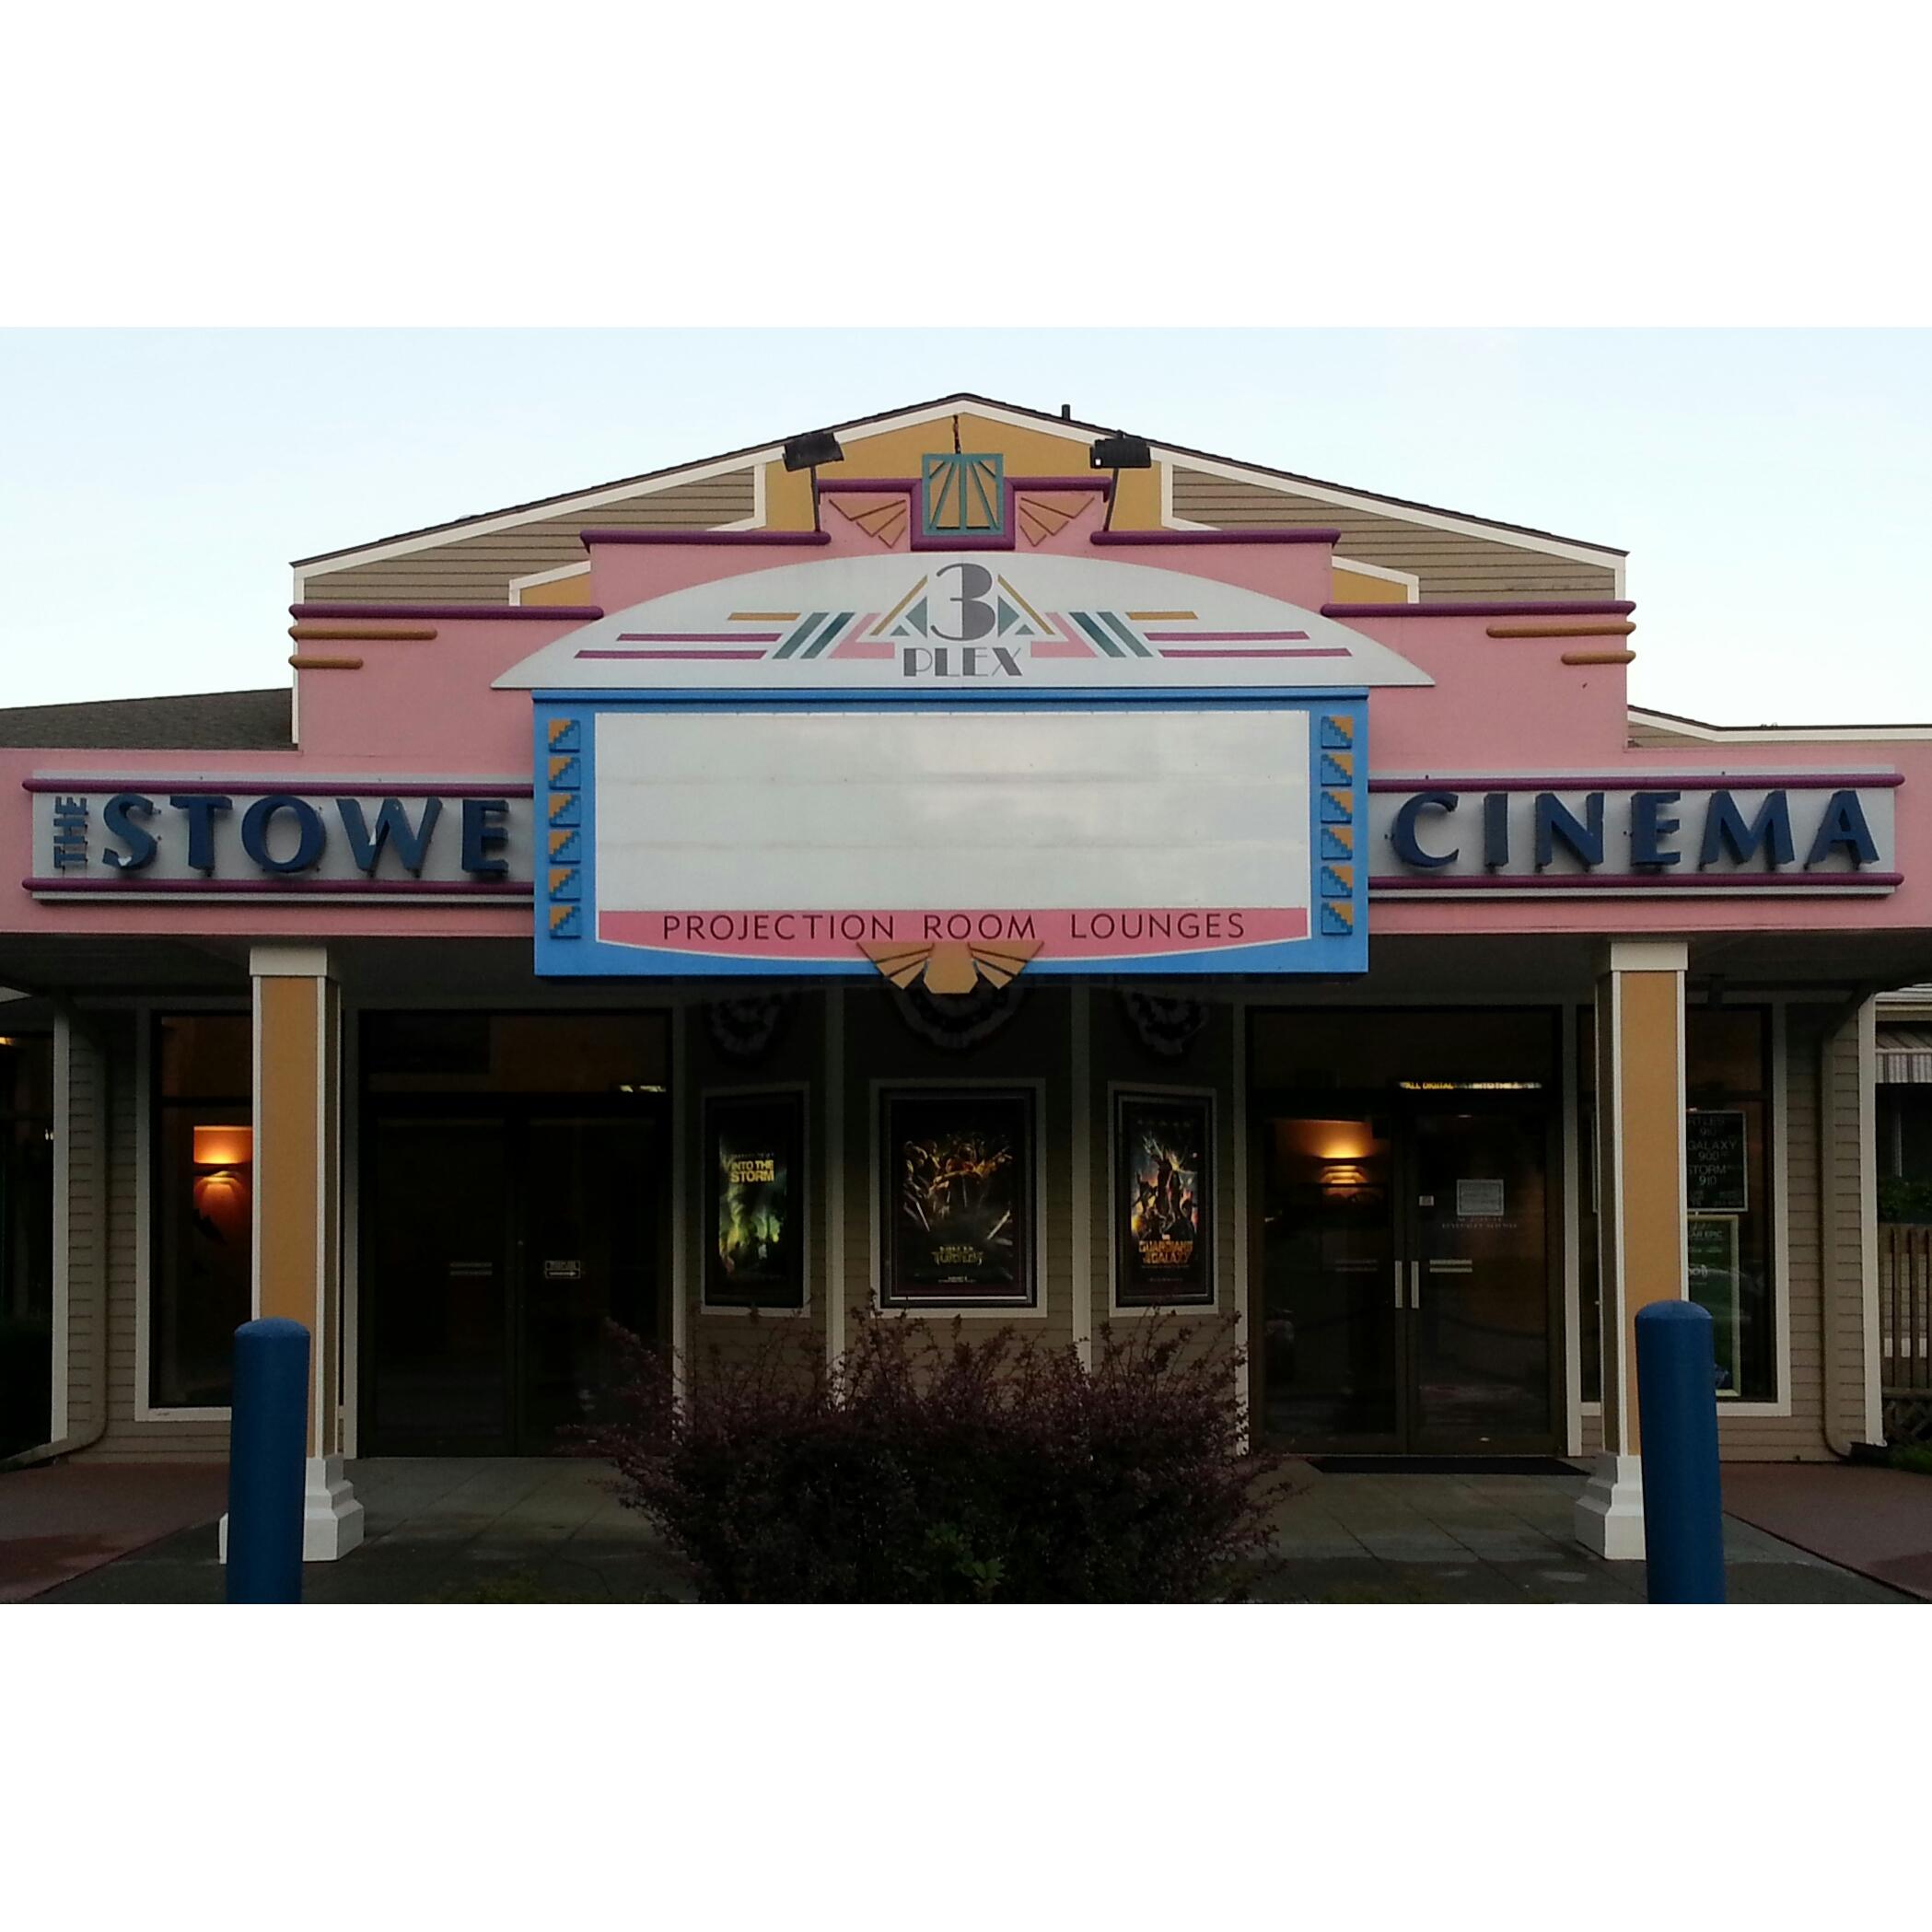 Stowe Cinema 3 plex & Projection Room Lounge